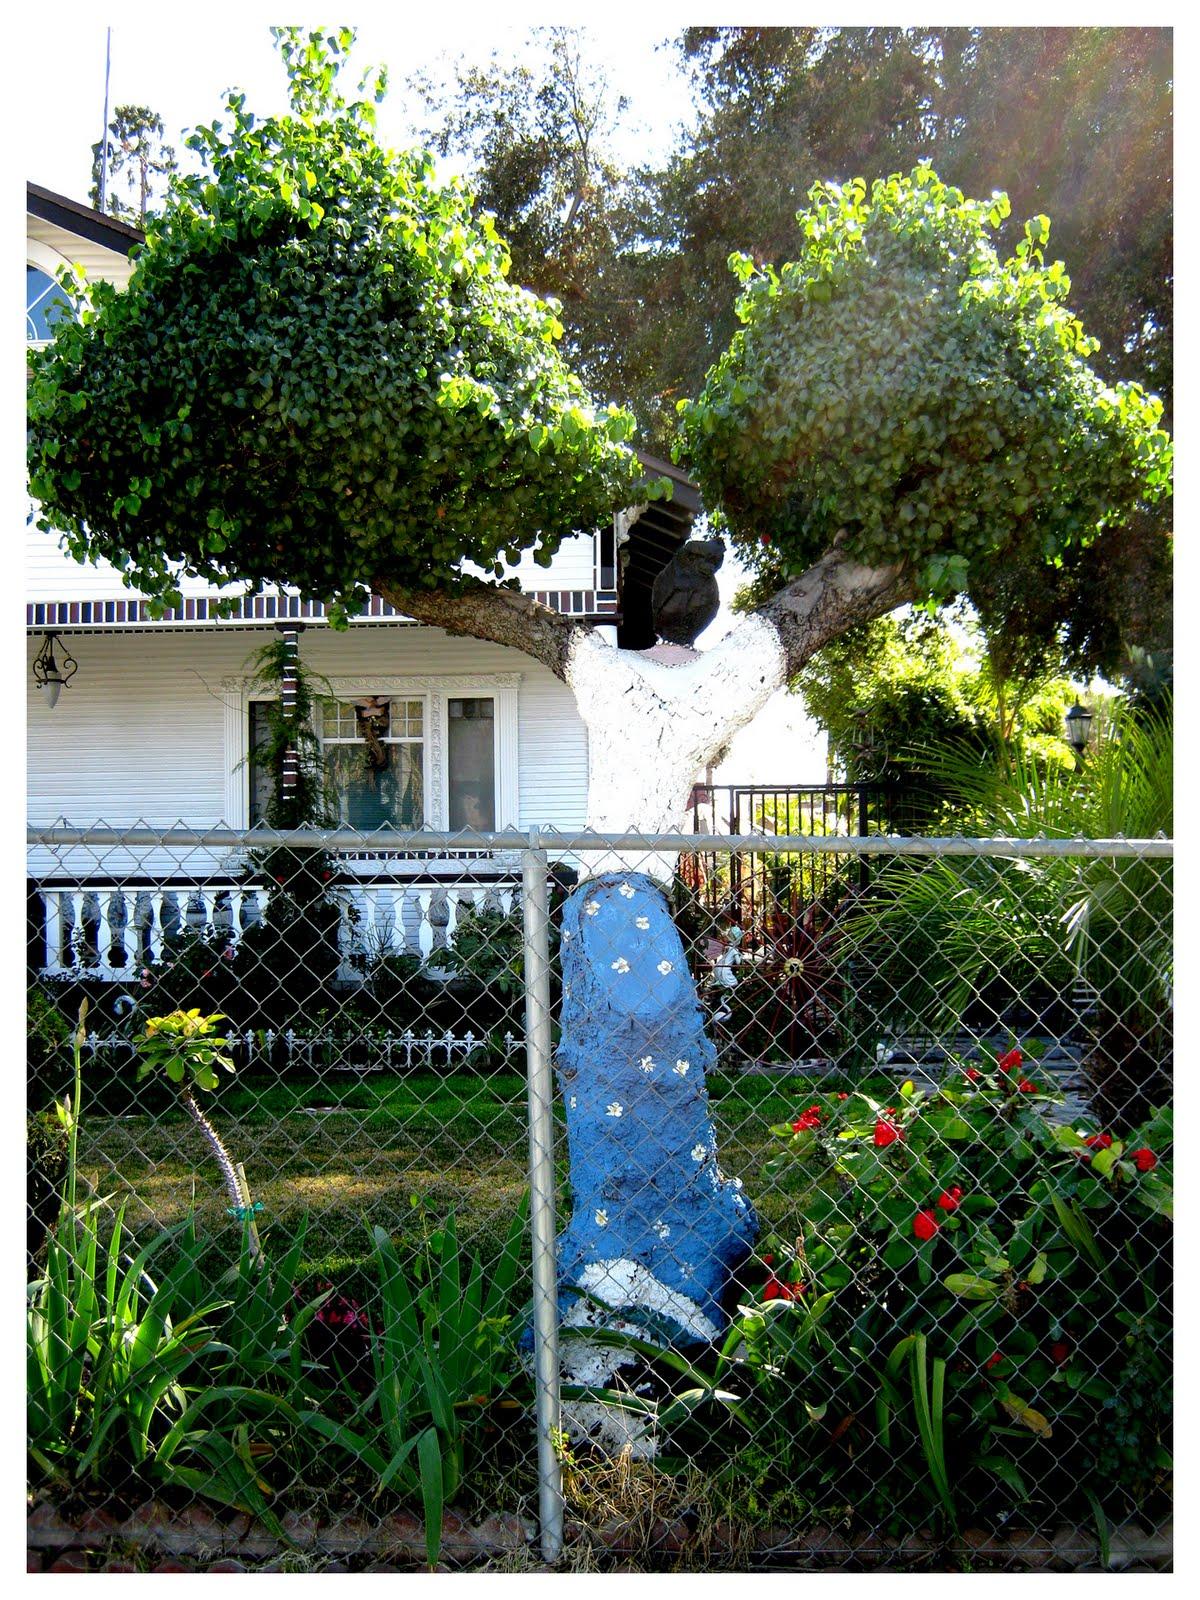 Paradis express rancho reubidoux for Jardin hispano mauresque